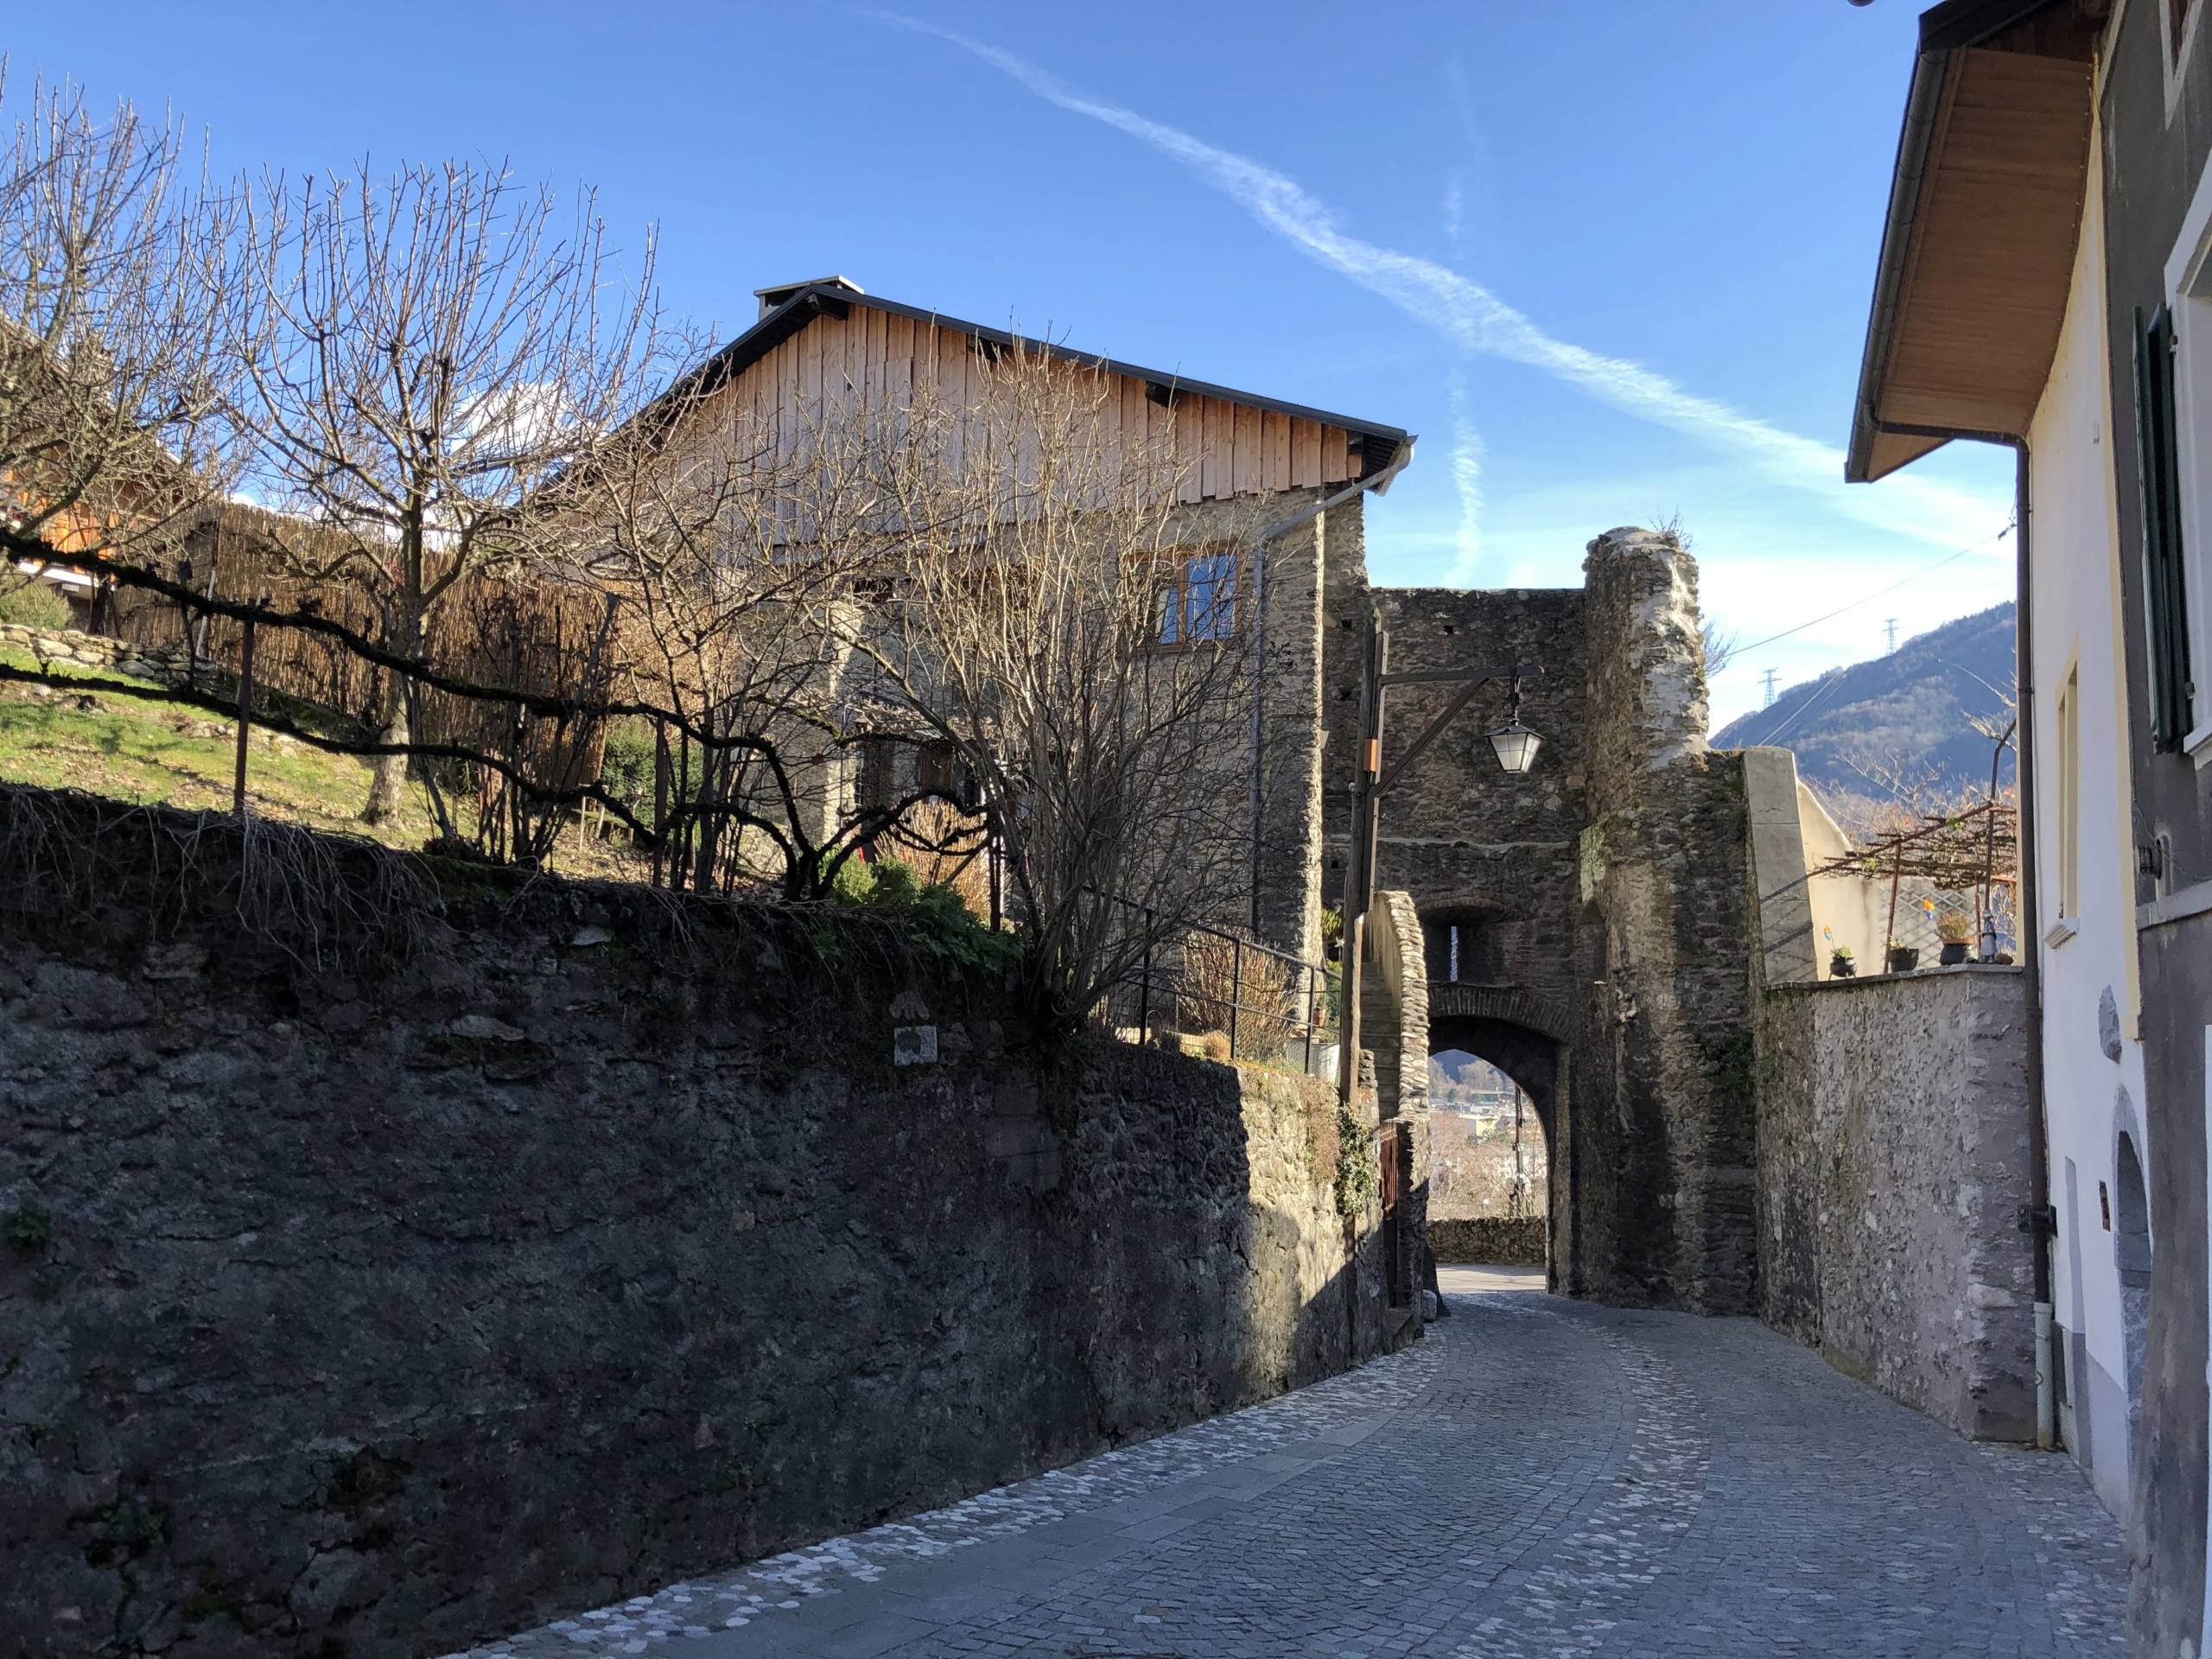 Petites balades en Rhône-Alpes - Page 2 Confla13